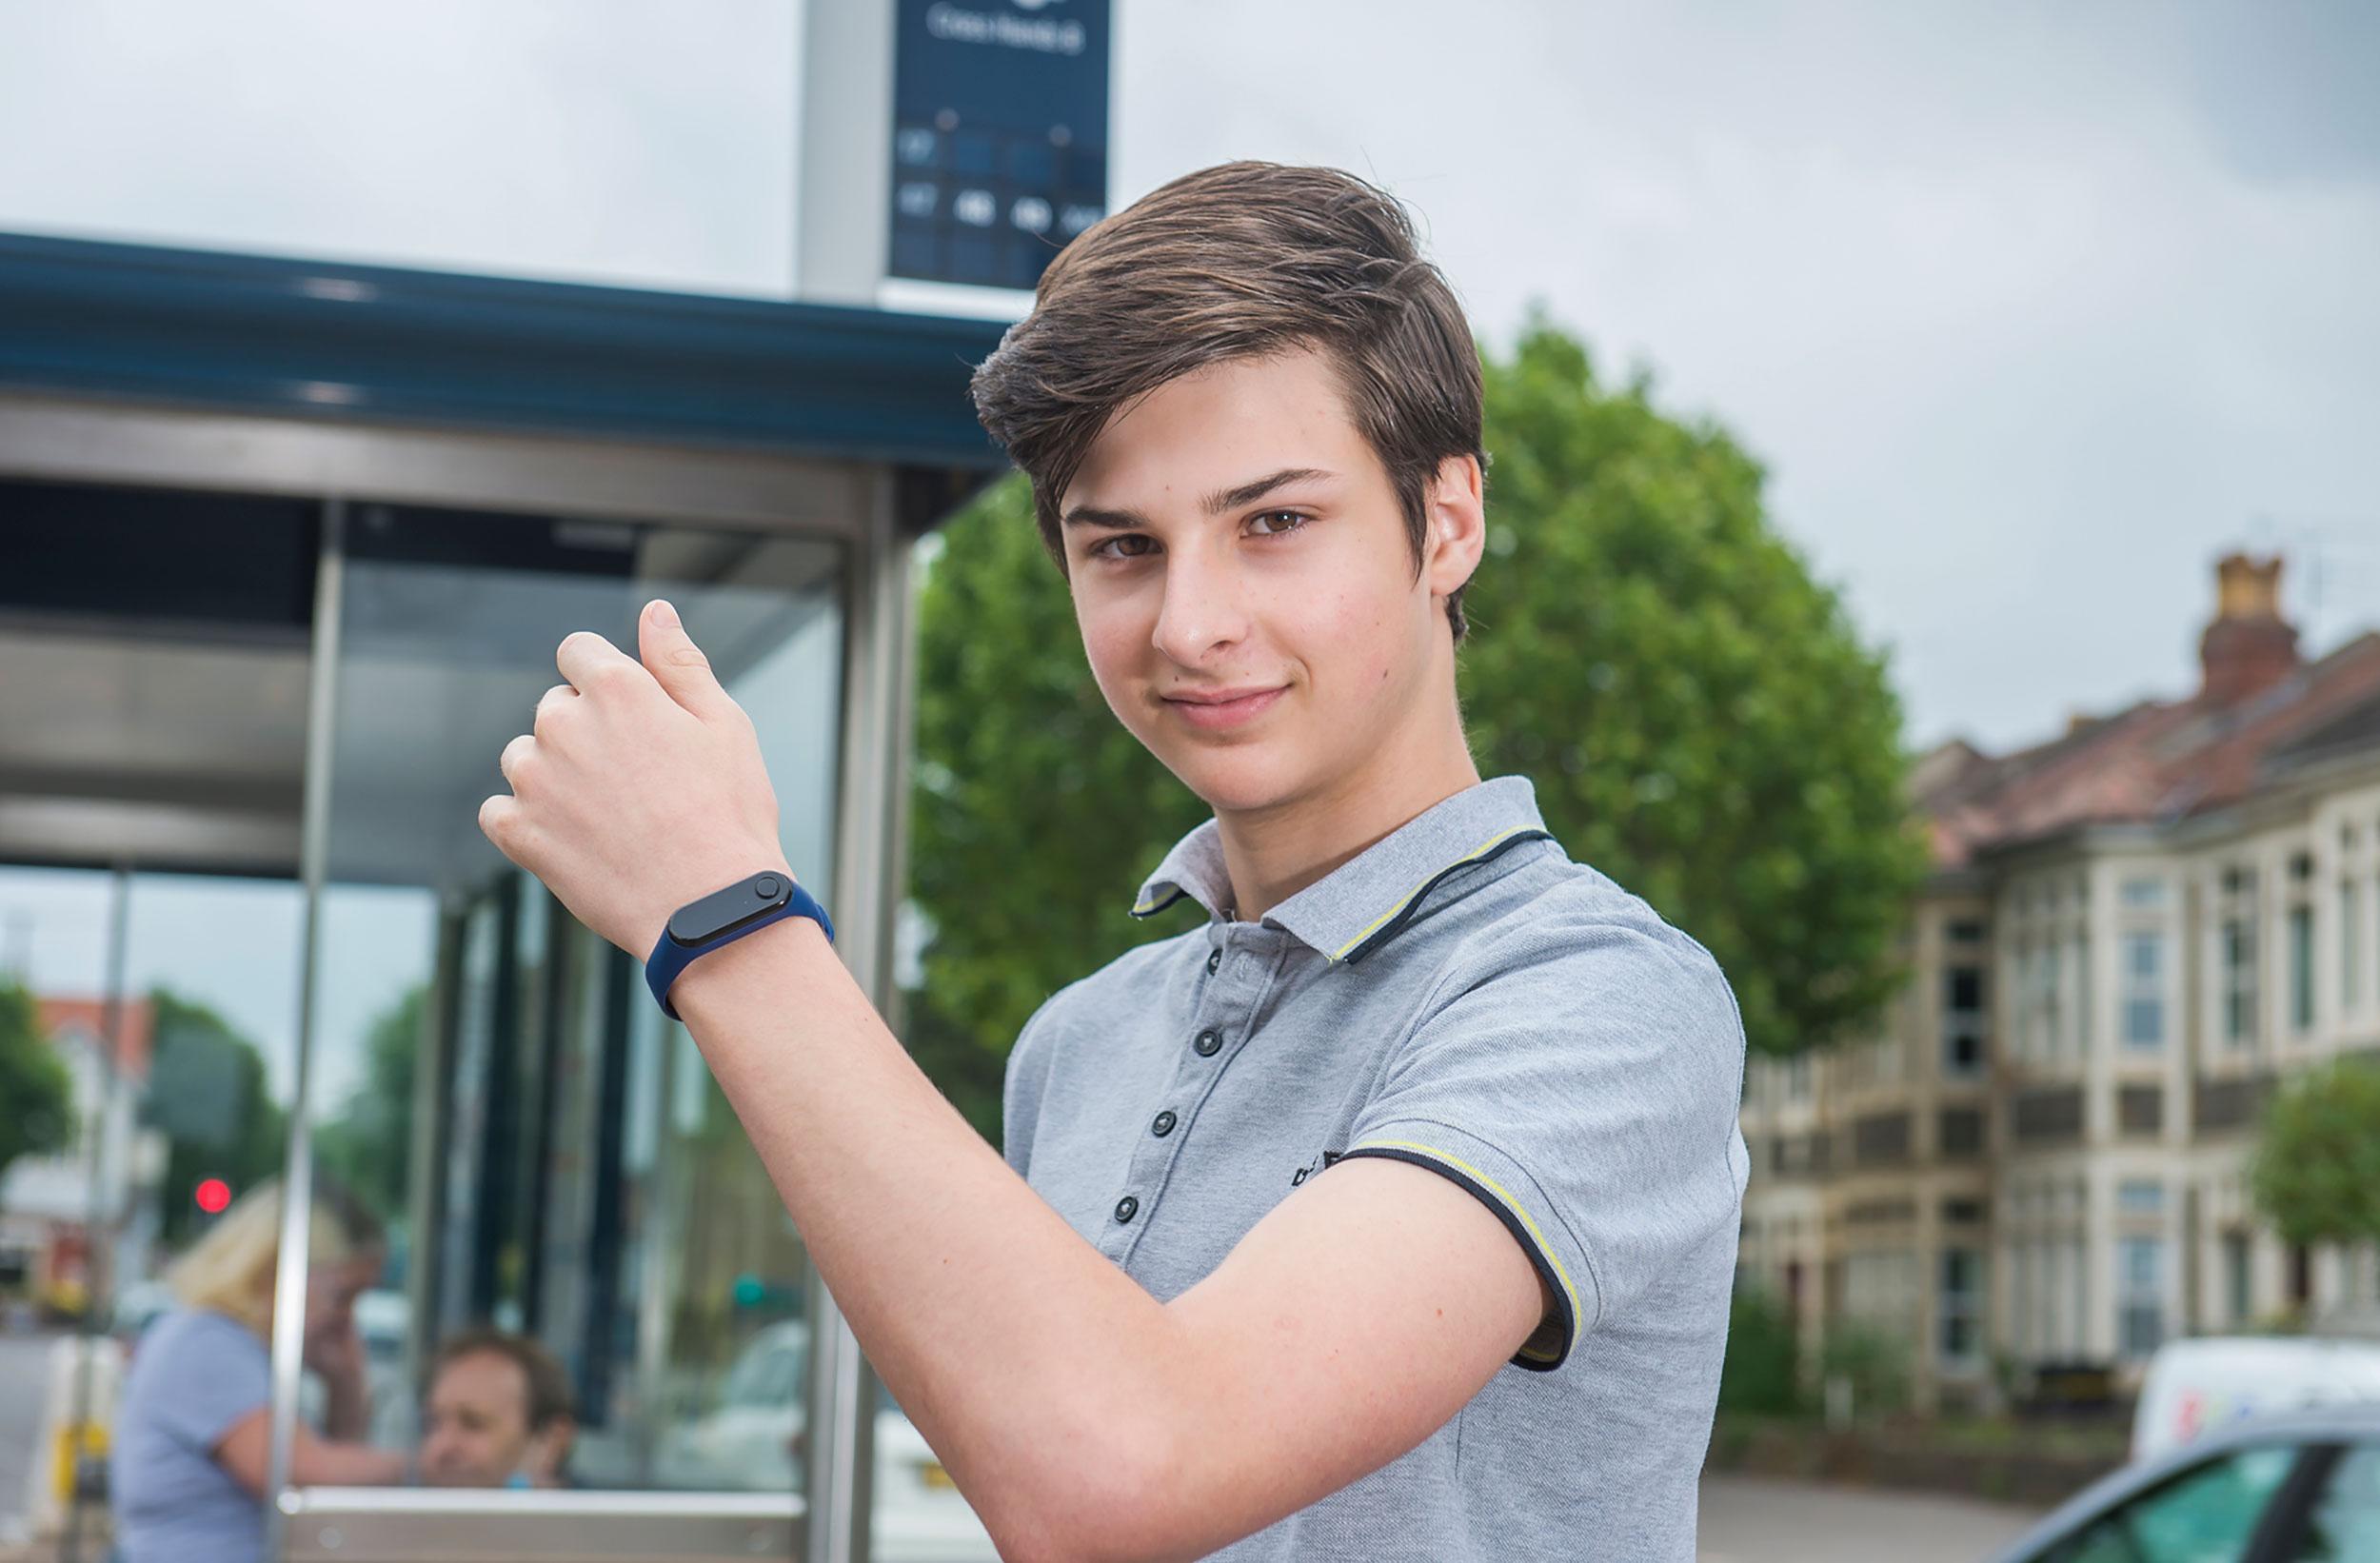 Max Melia, 15, wearing his Vybpro watch.